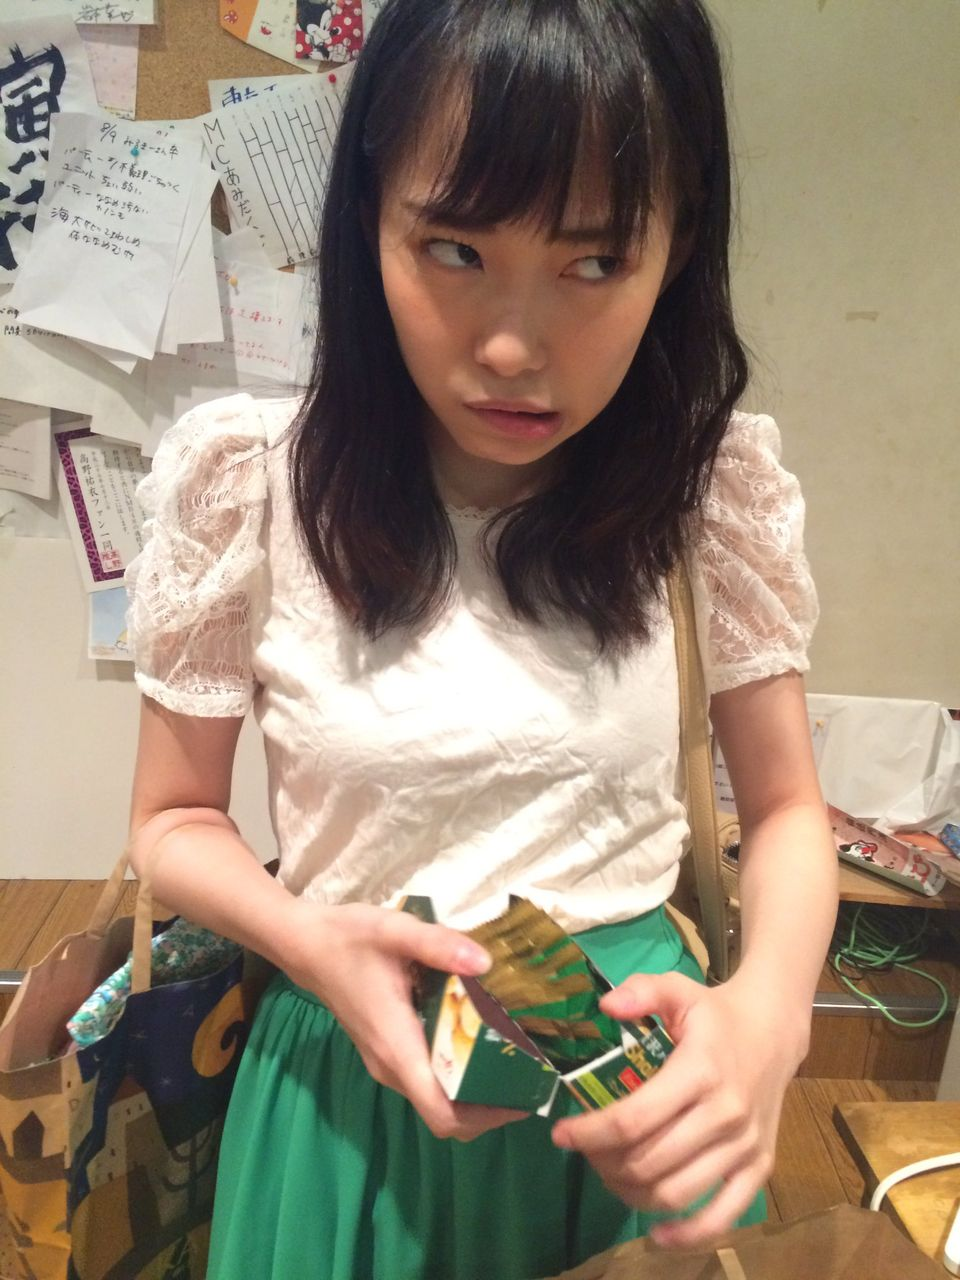 【NMB48】石塚朱莉が抹茶クッキーを食べたぁあああああ!!!!